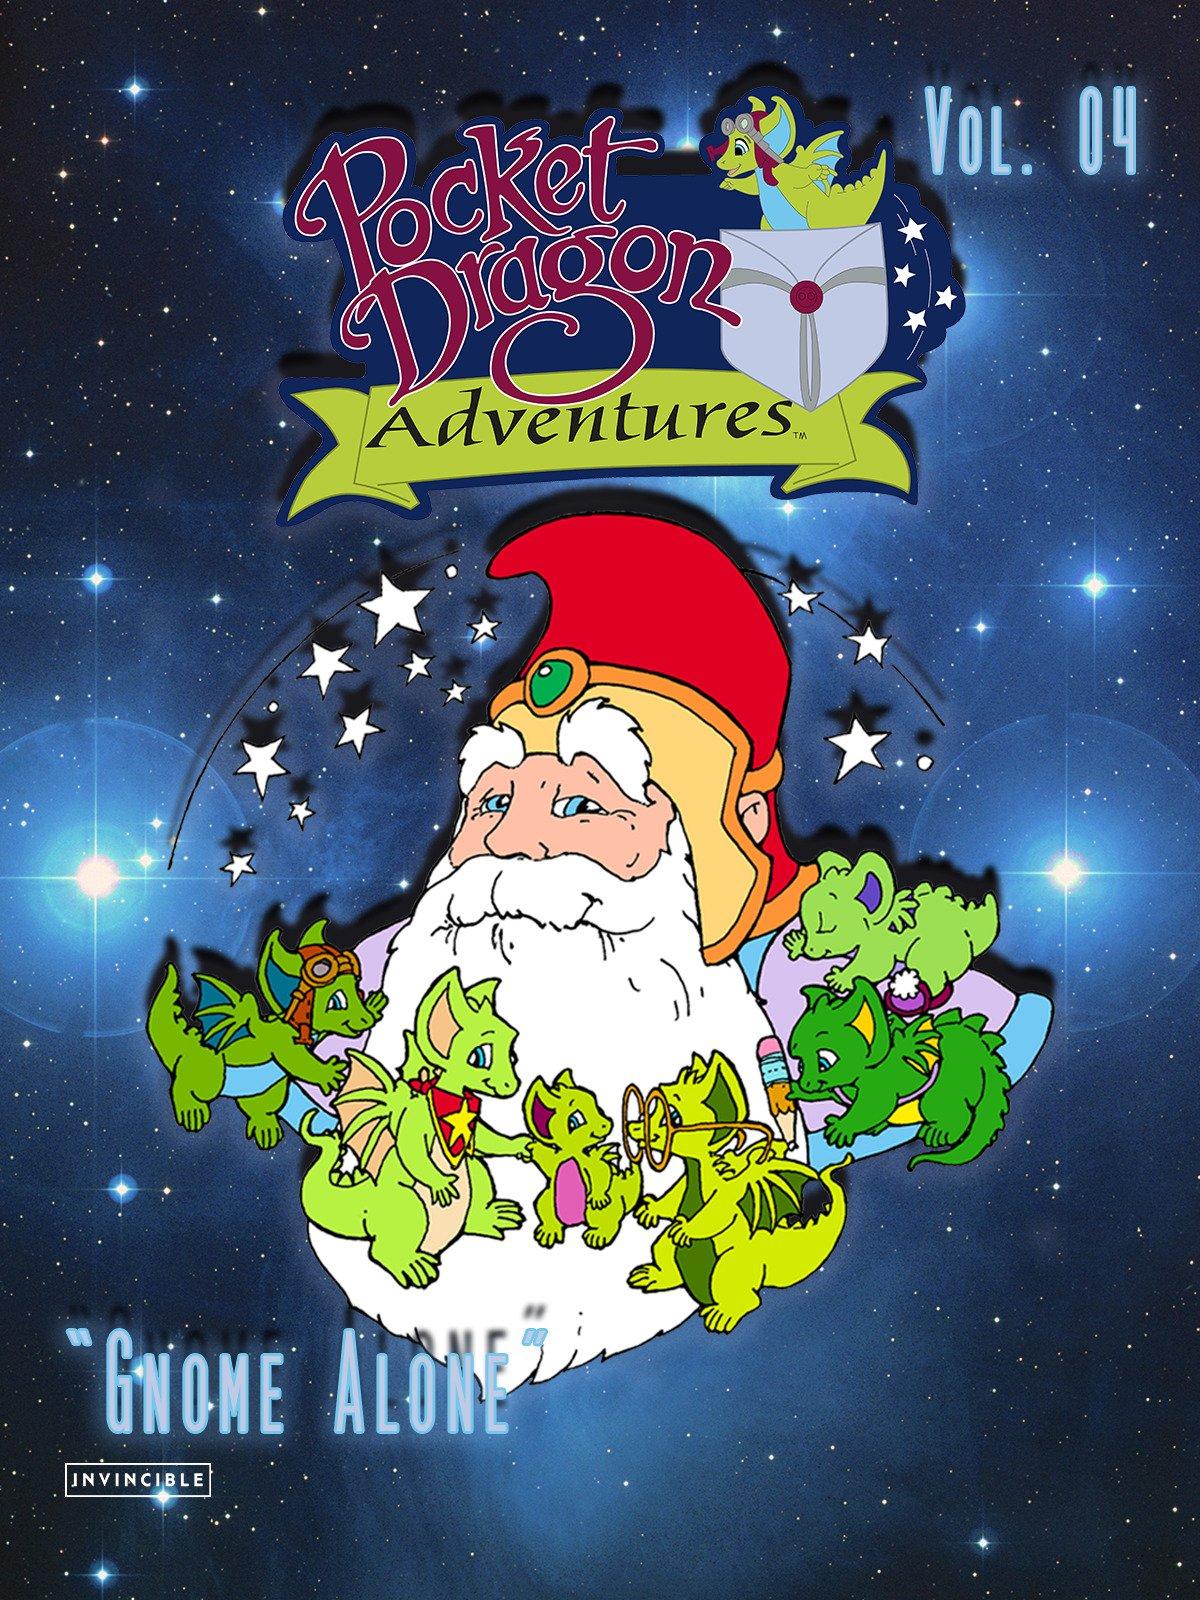 Pocket Dragon Adventures Vol. 04Gnome Alone